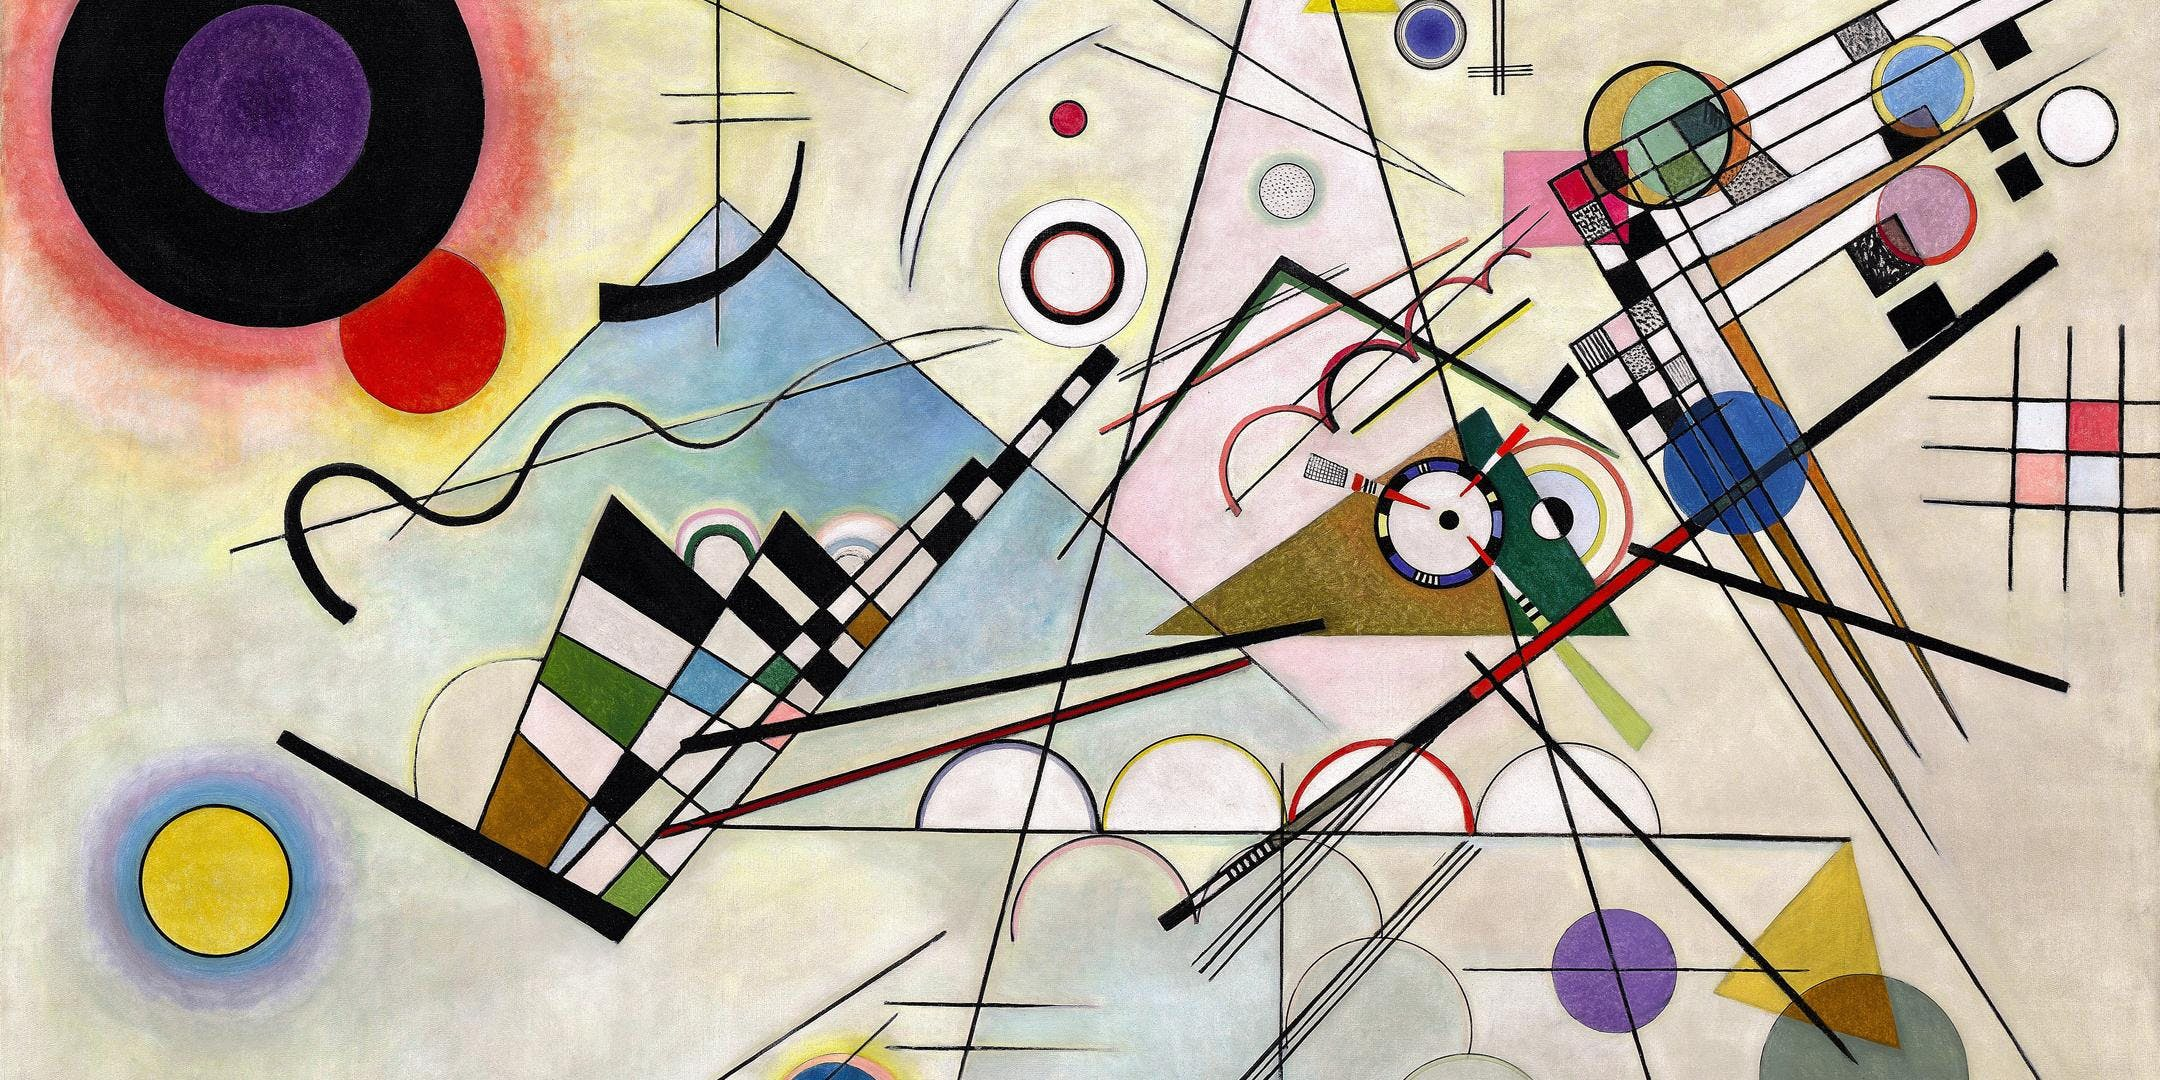 Kandinsky, Albers, Klee and the Bauhaus - wit